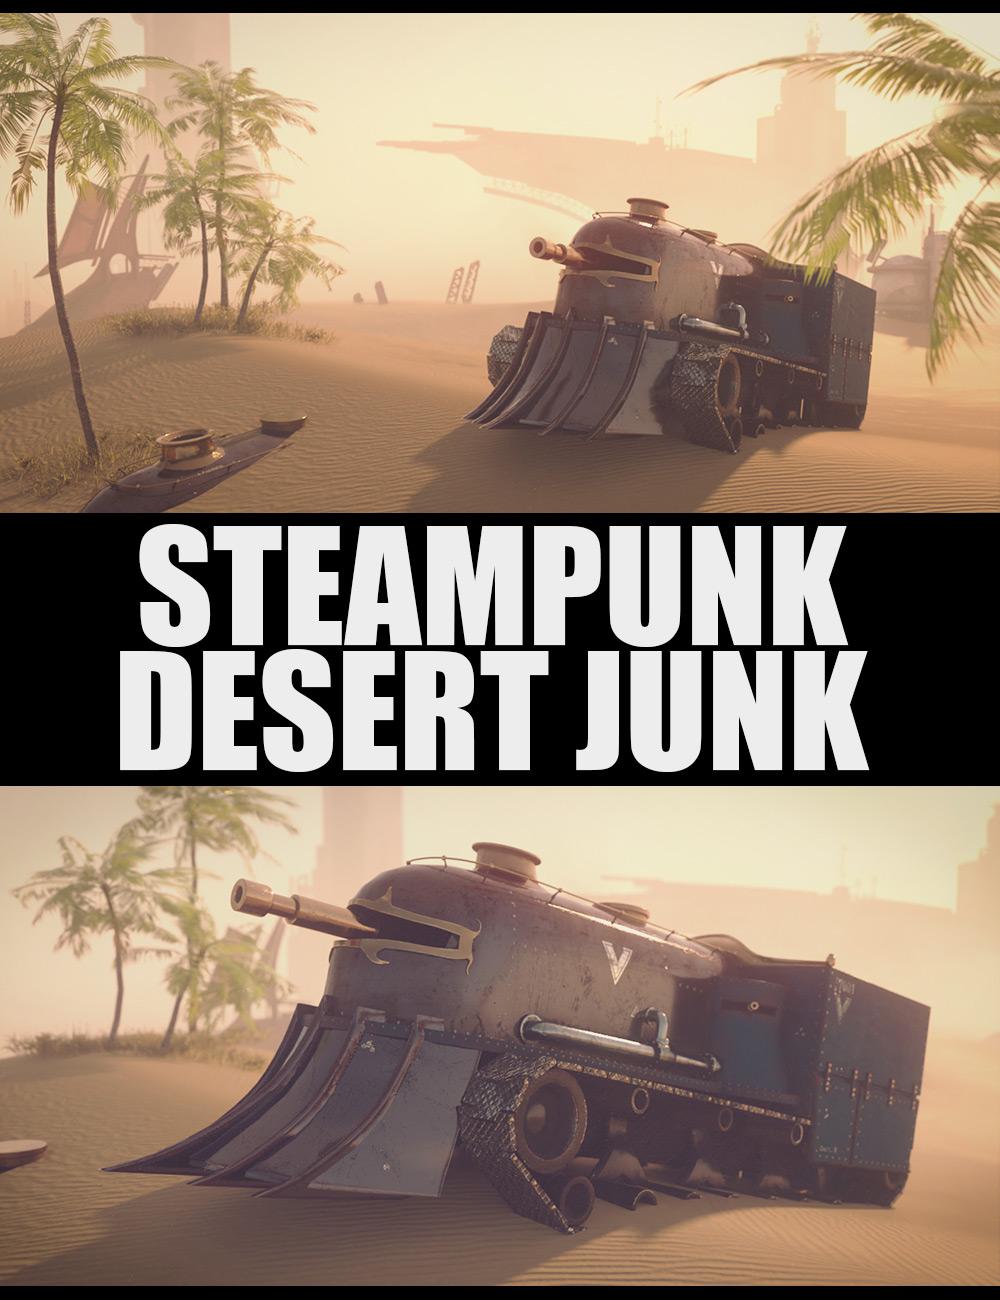 Steampunk Desert Junk by: Dreamlight2 create HB, 3D Models by Daz 3D